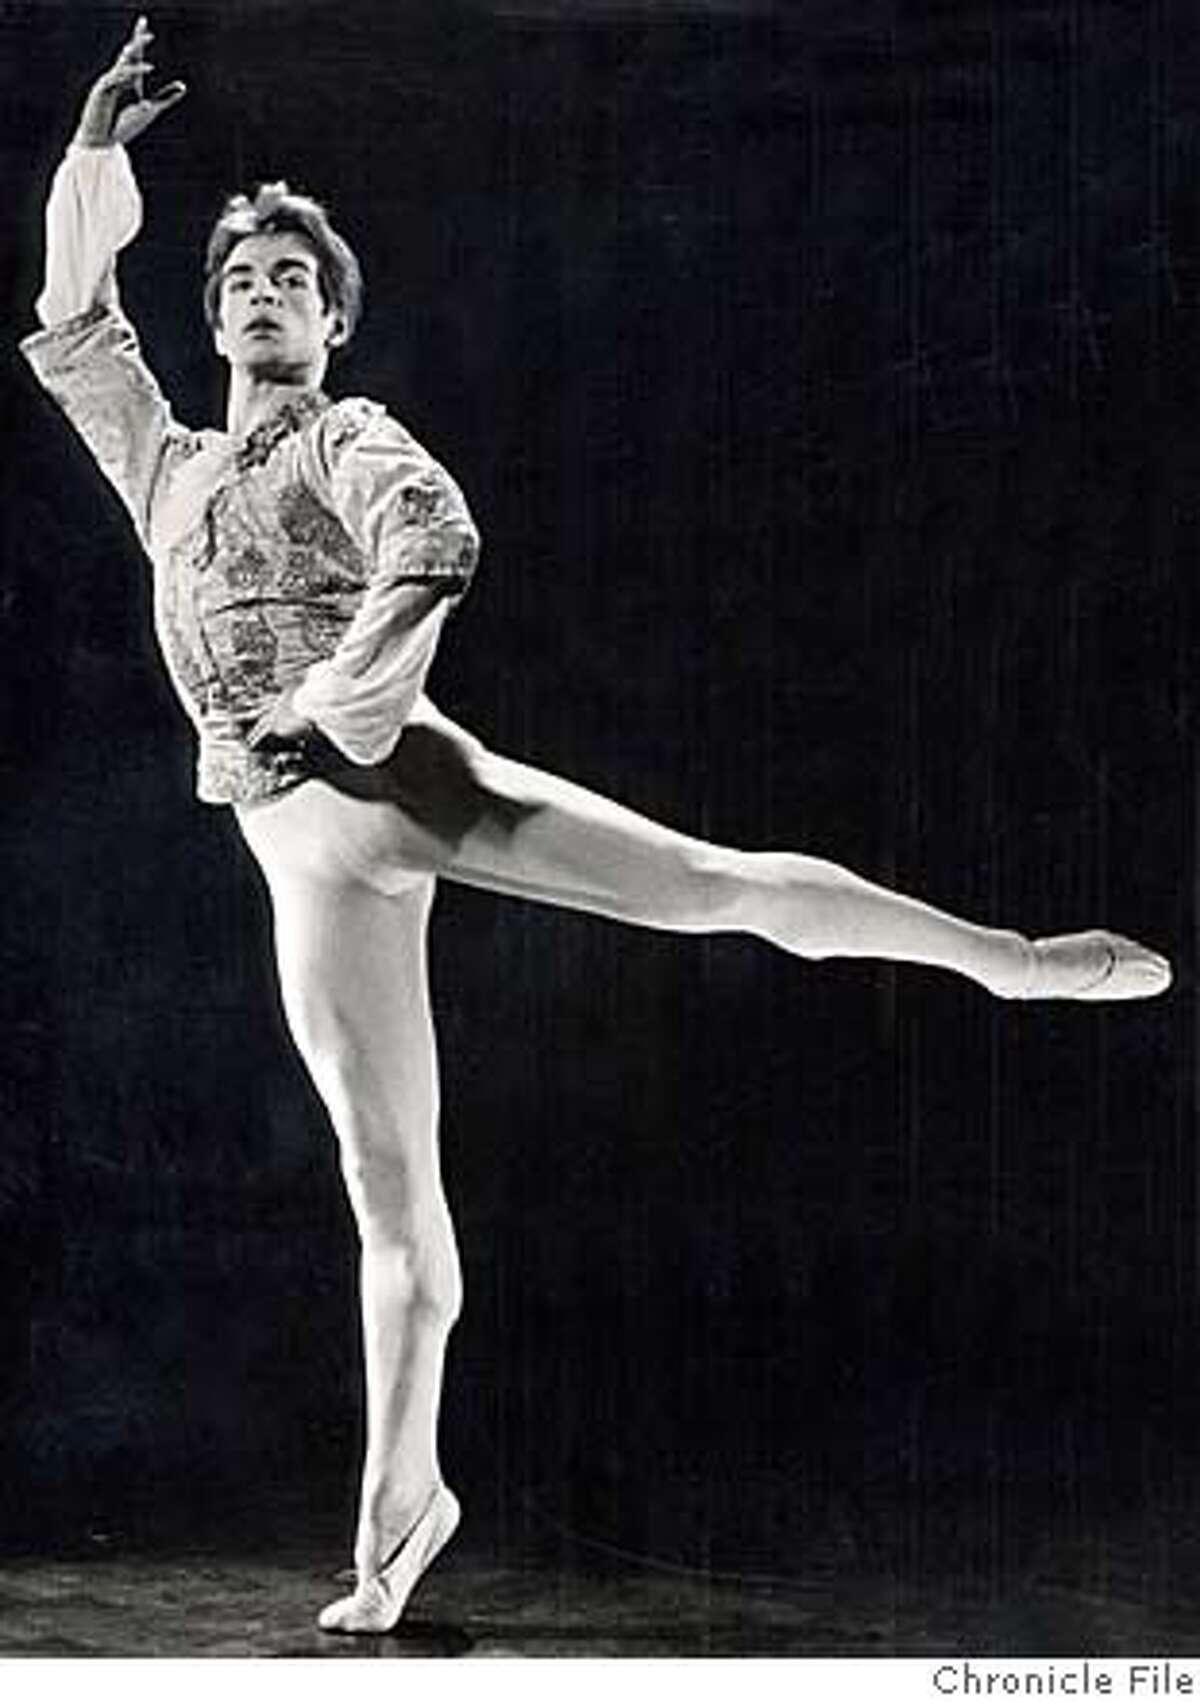 NUREYEV/C/16JUL99/MN/HO--Rudolf Nureyev Russian ballwr dancer. Chronicle file photo of 1970's ALSO RAN 12/26/02, 1/1/03 CAT